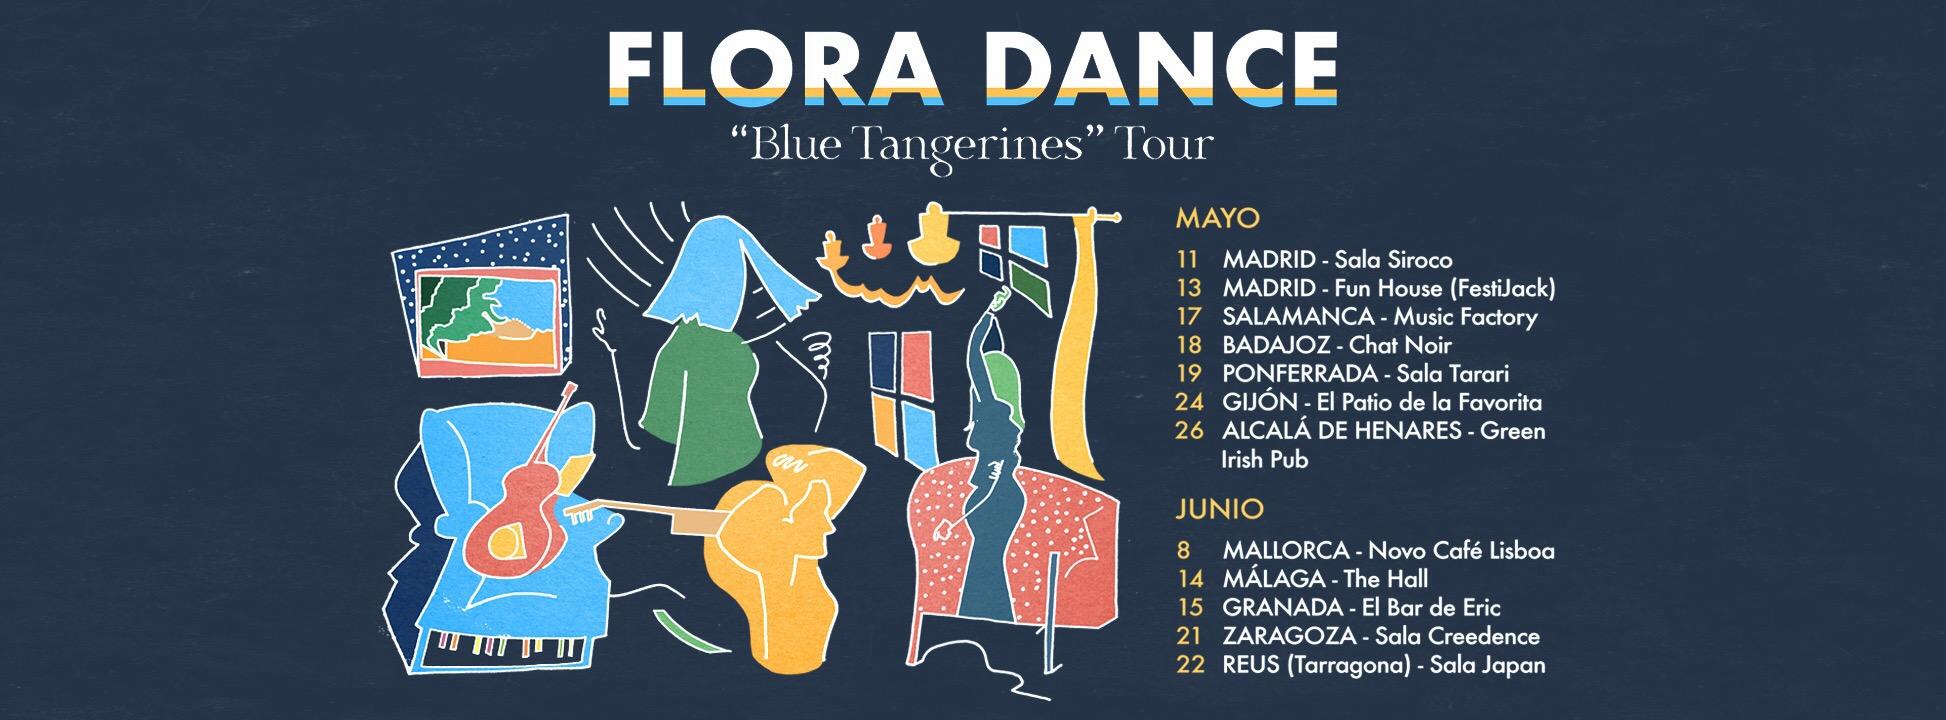 Flora Dance a punto de comenzar su primera gira